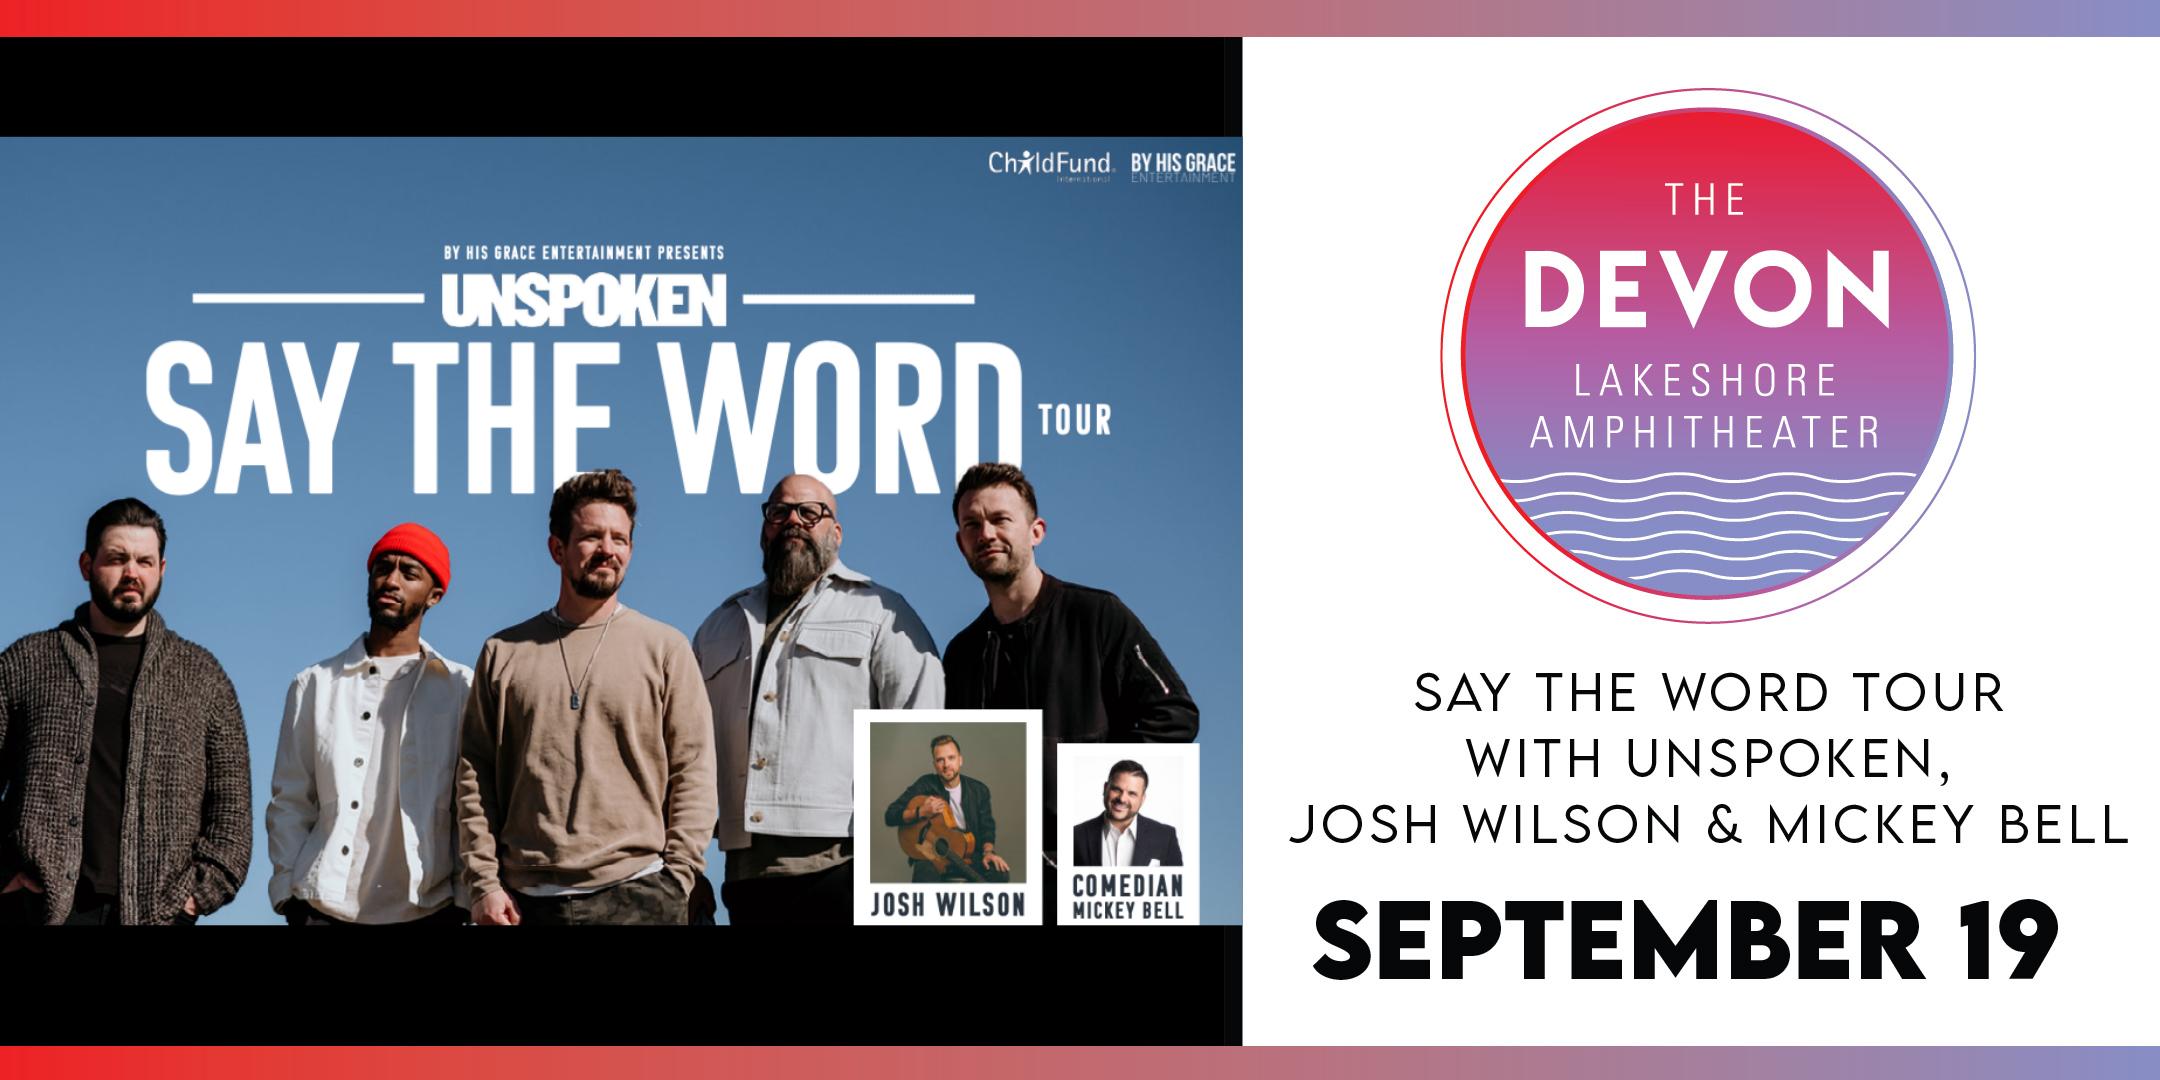 Unspoken Say The Word Concert Images for September 19